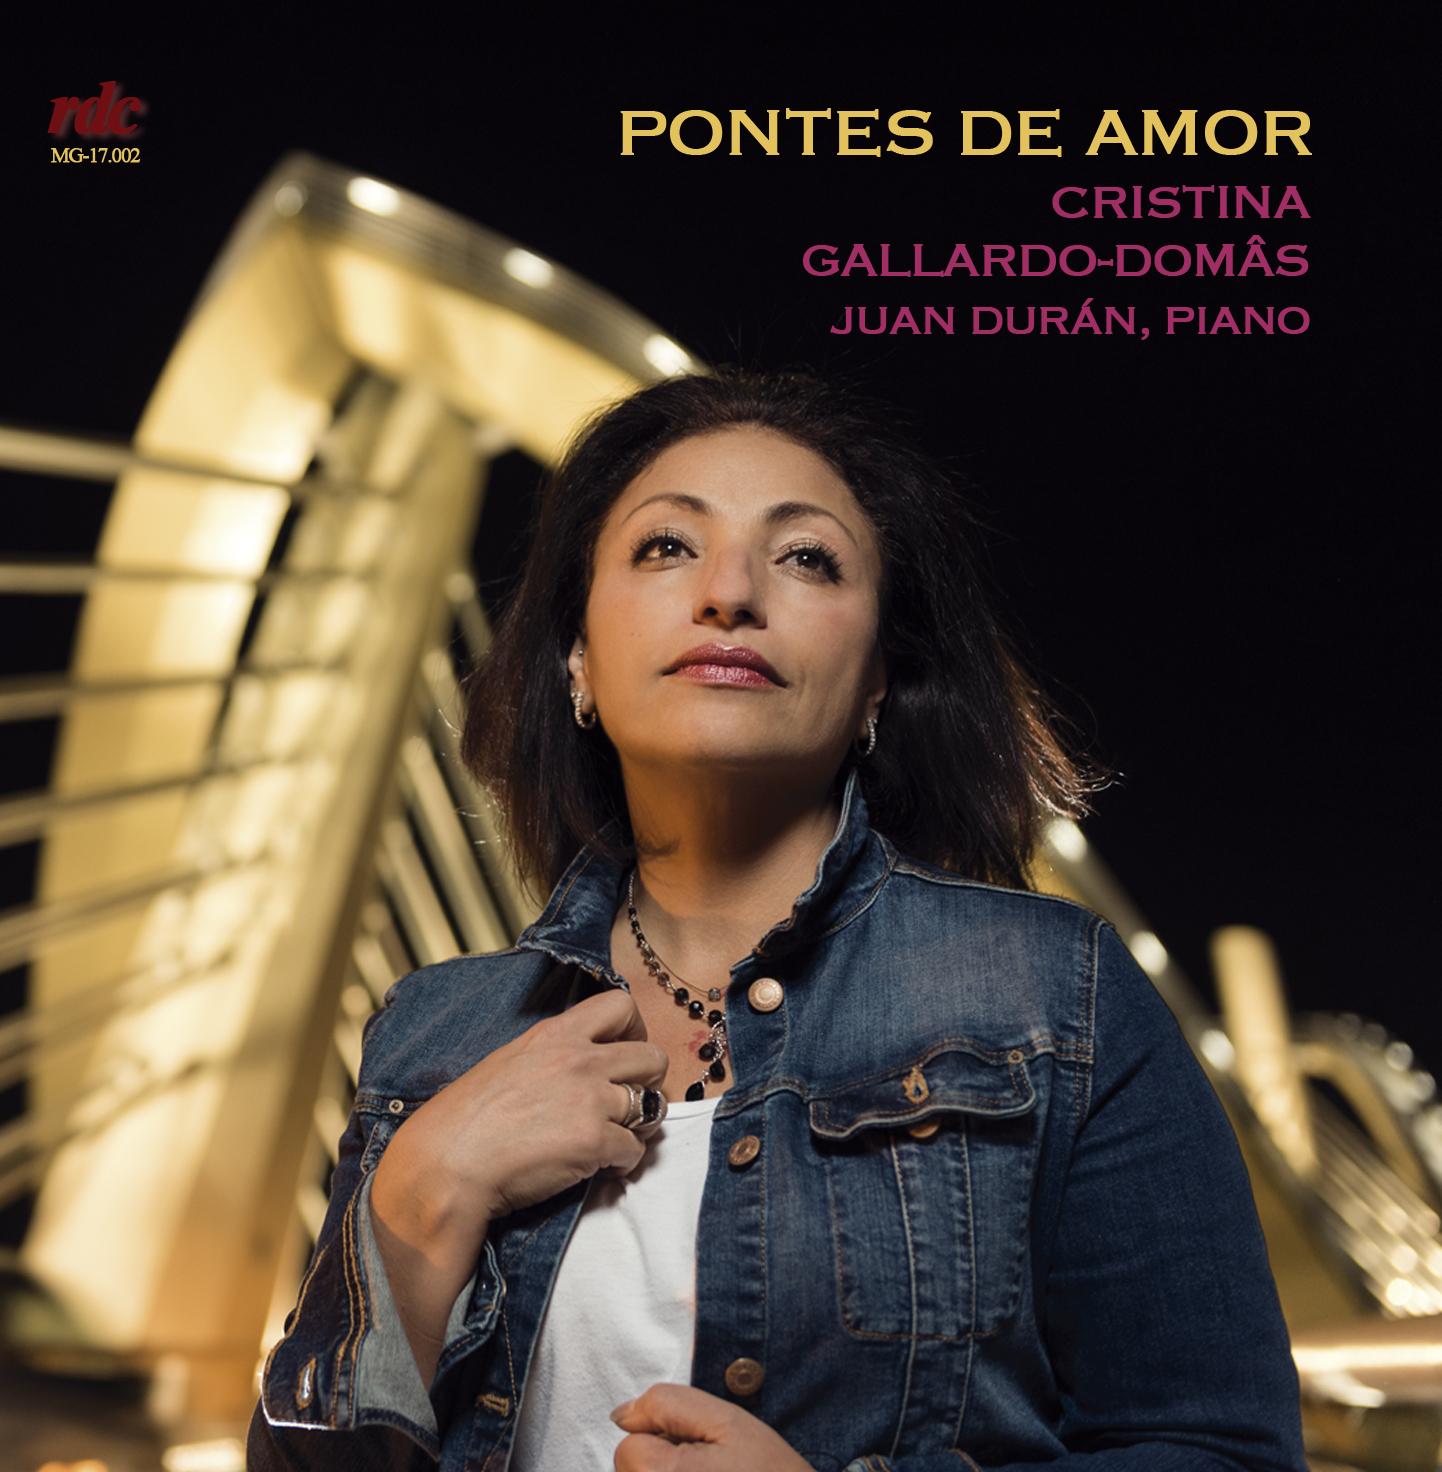 J. Durán grava un CD coa soprano Cristina Gallardo-Domâs